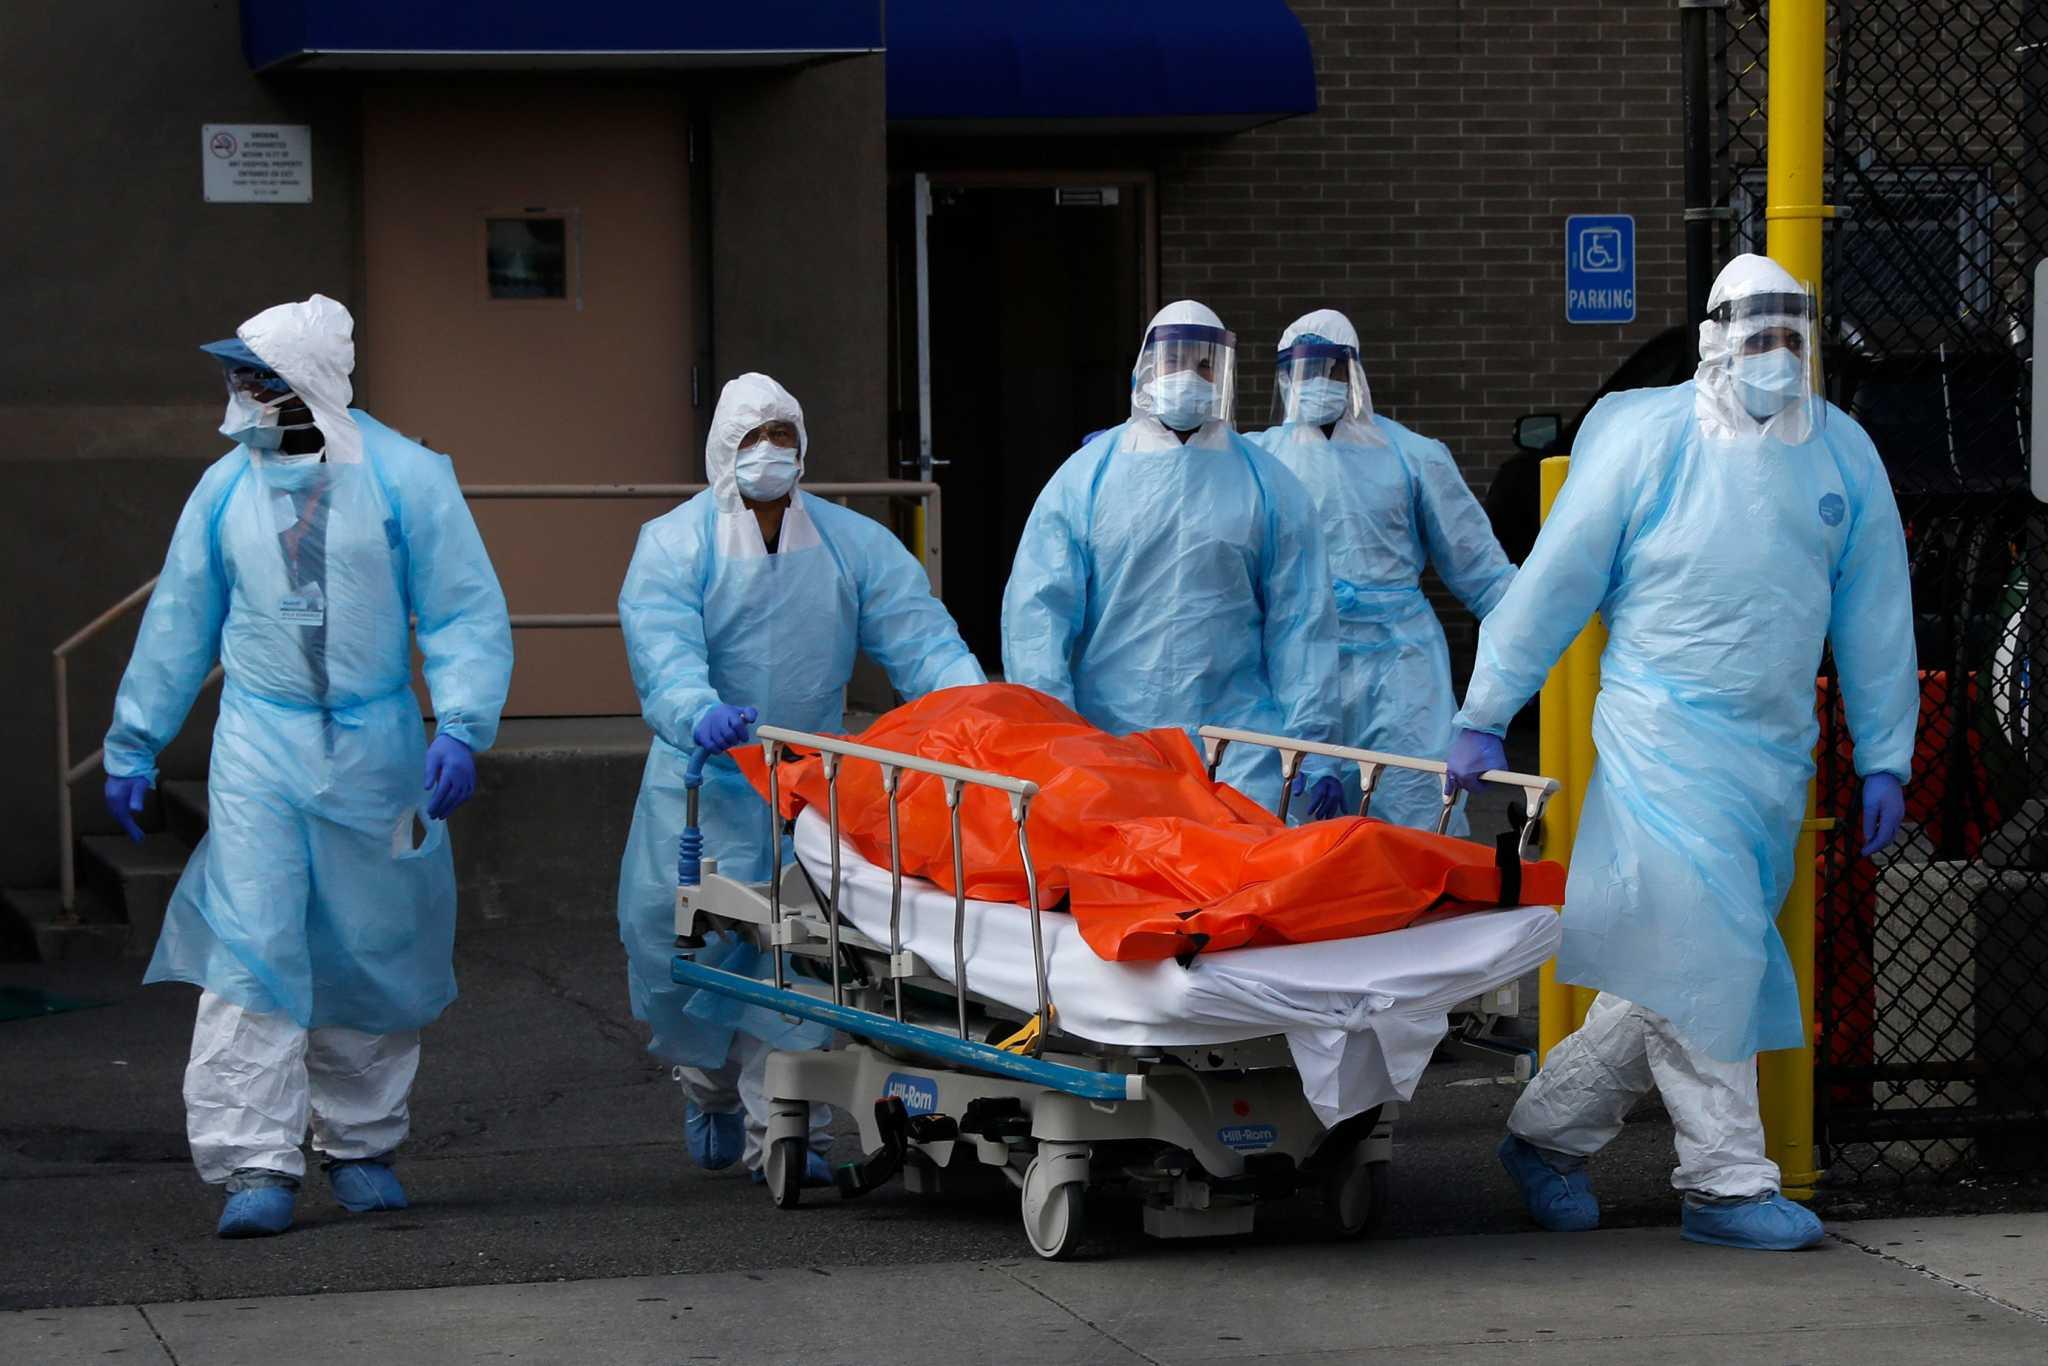 Koροναϊός :Και άλλος θάνατος από κορωνοϊό στη Χαλκίδα